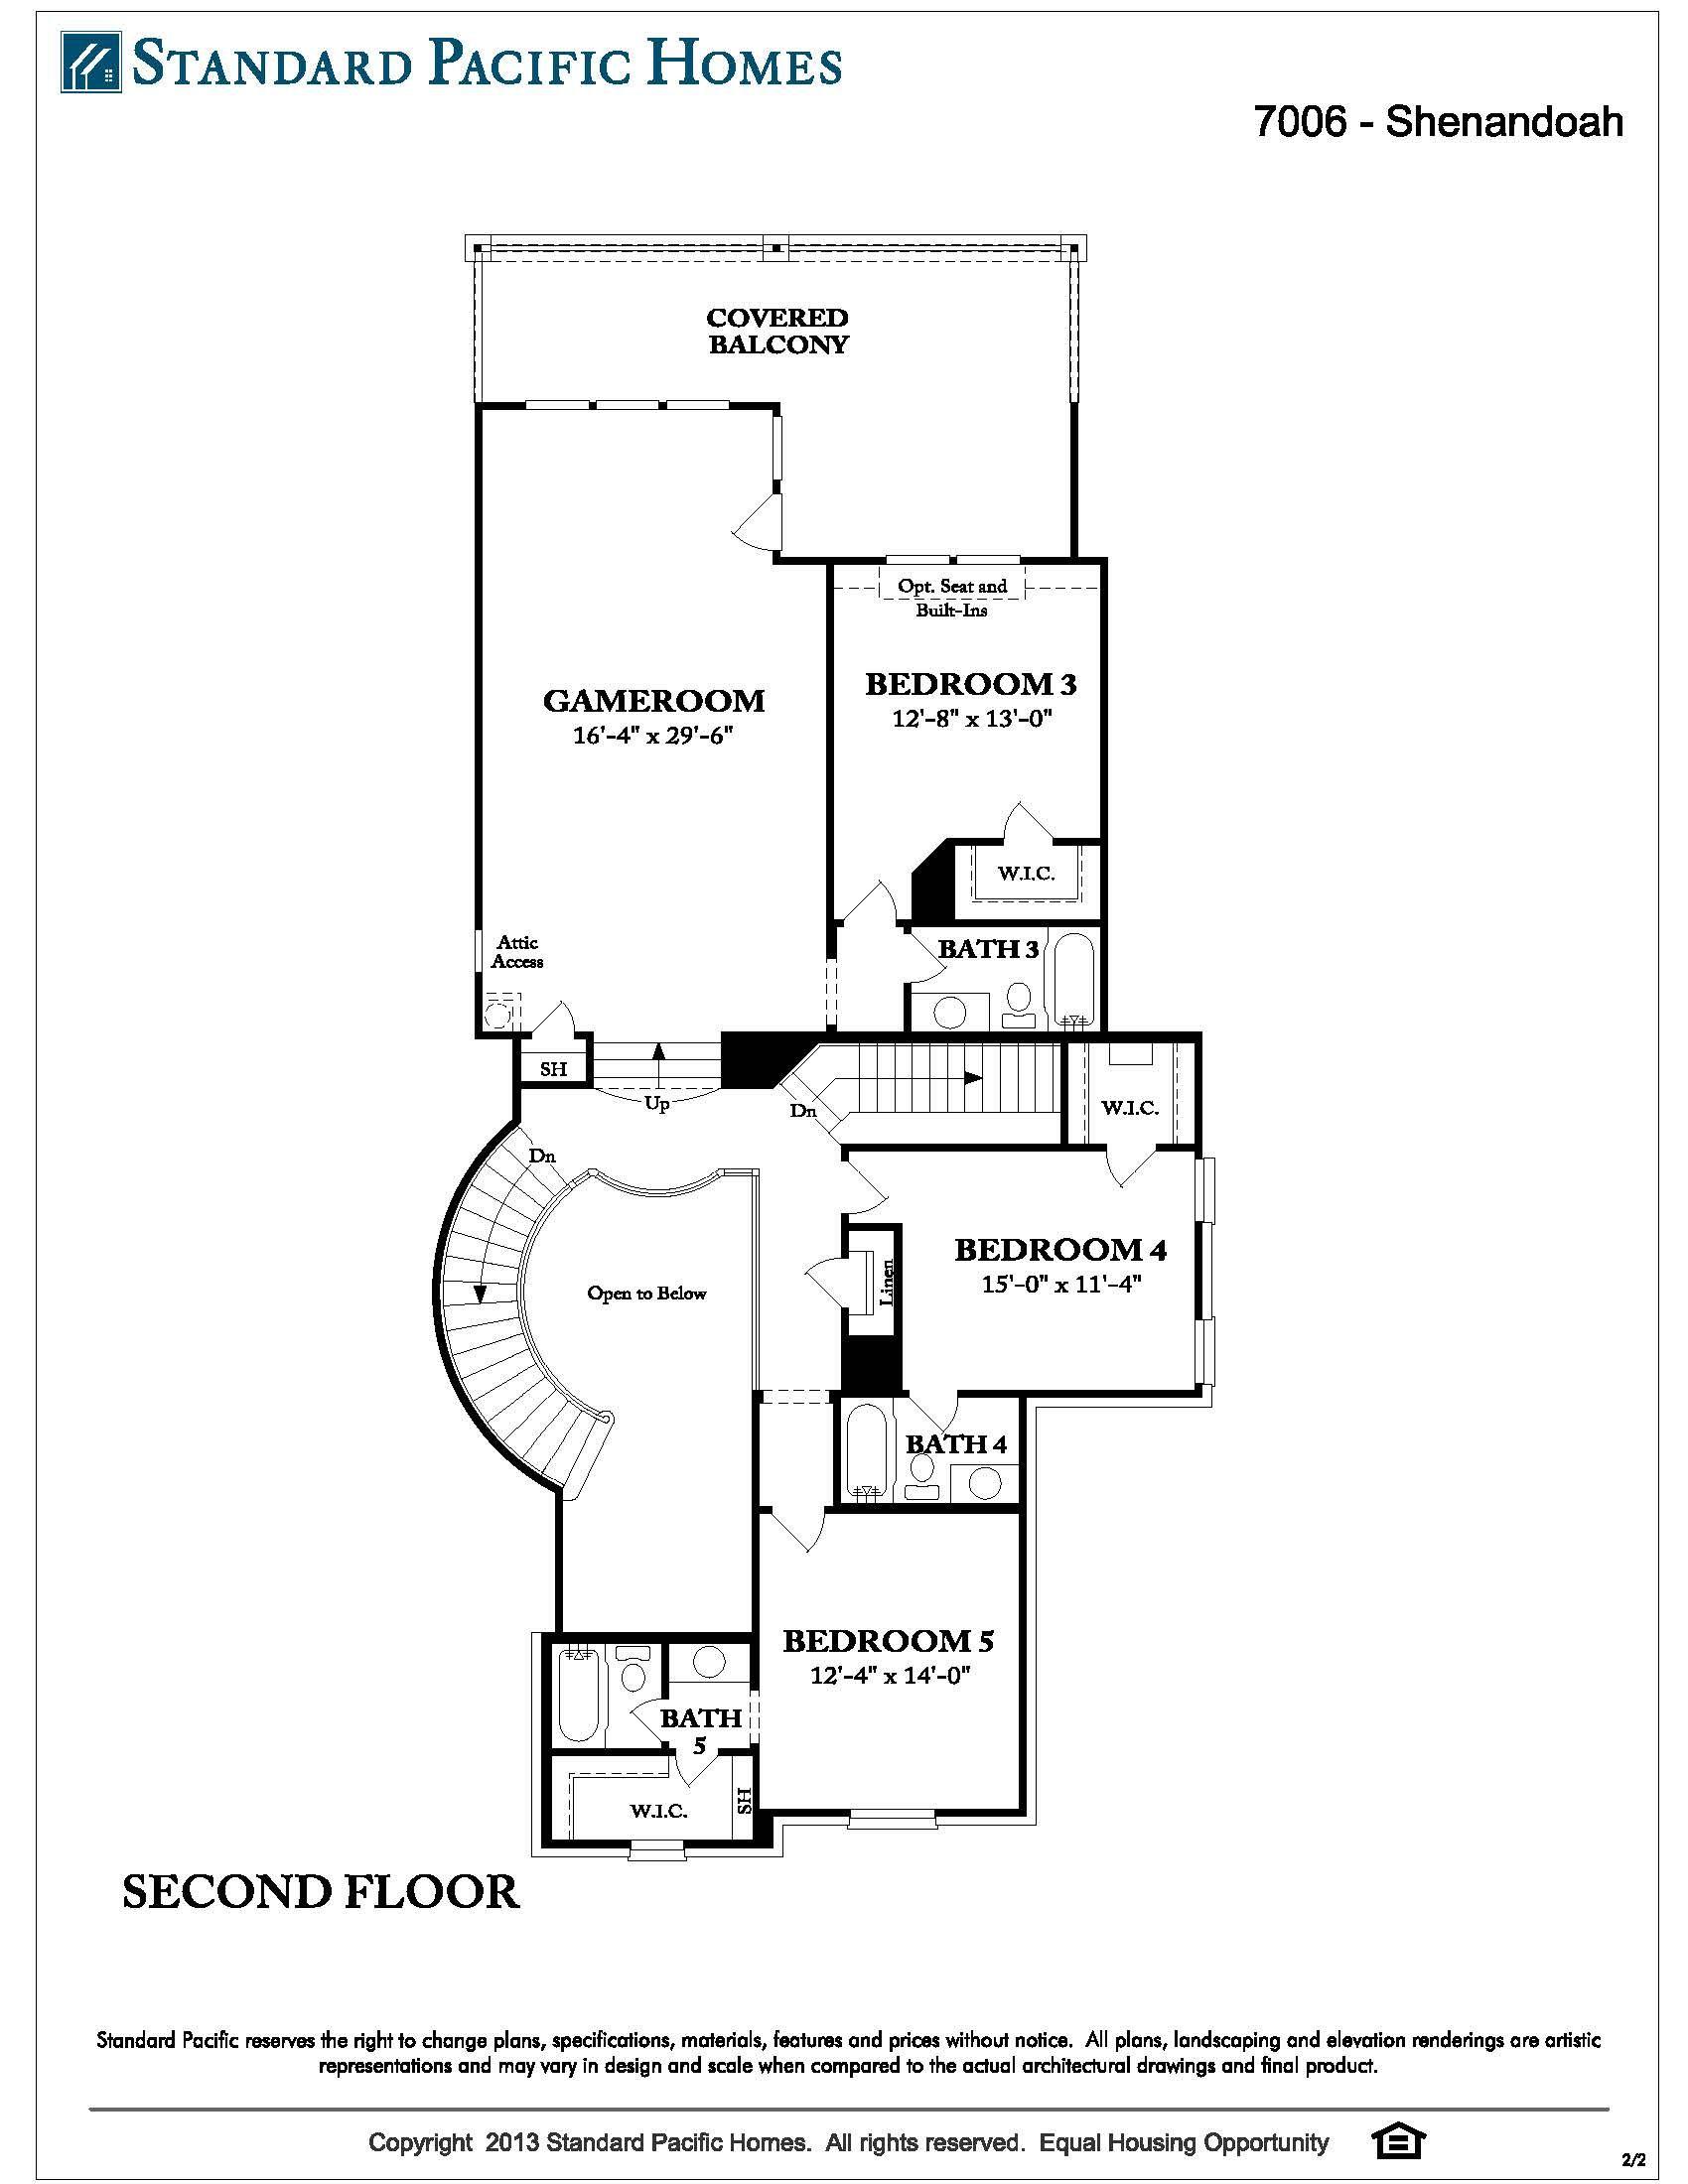 standard pacific shenandoah 2d floor floor plans pinterest